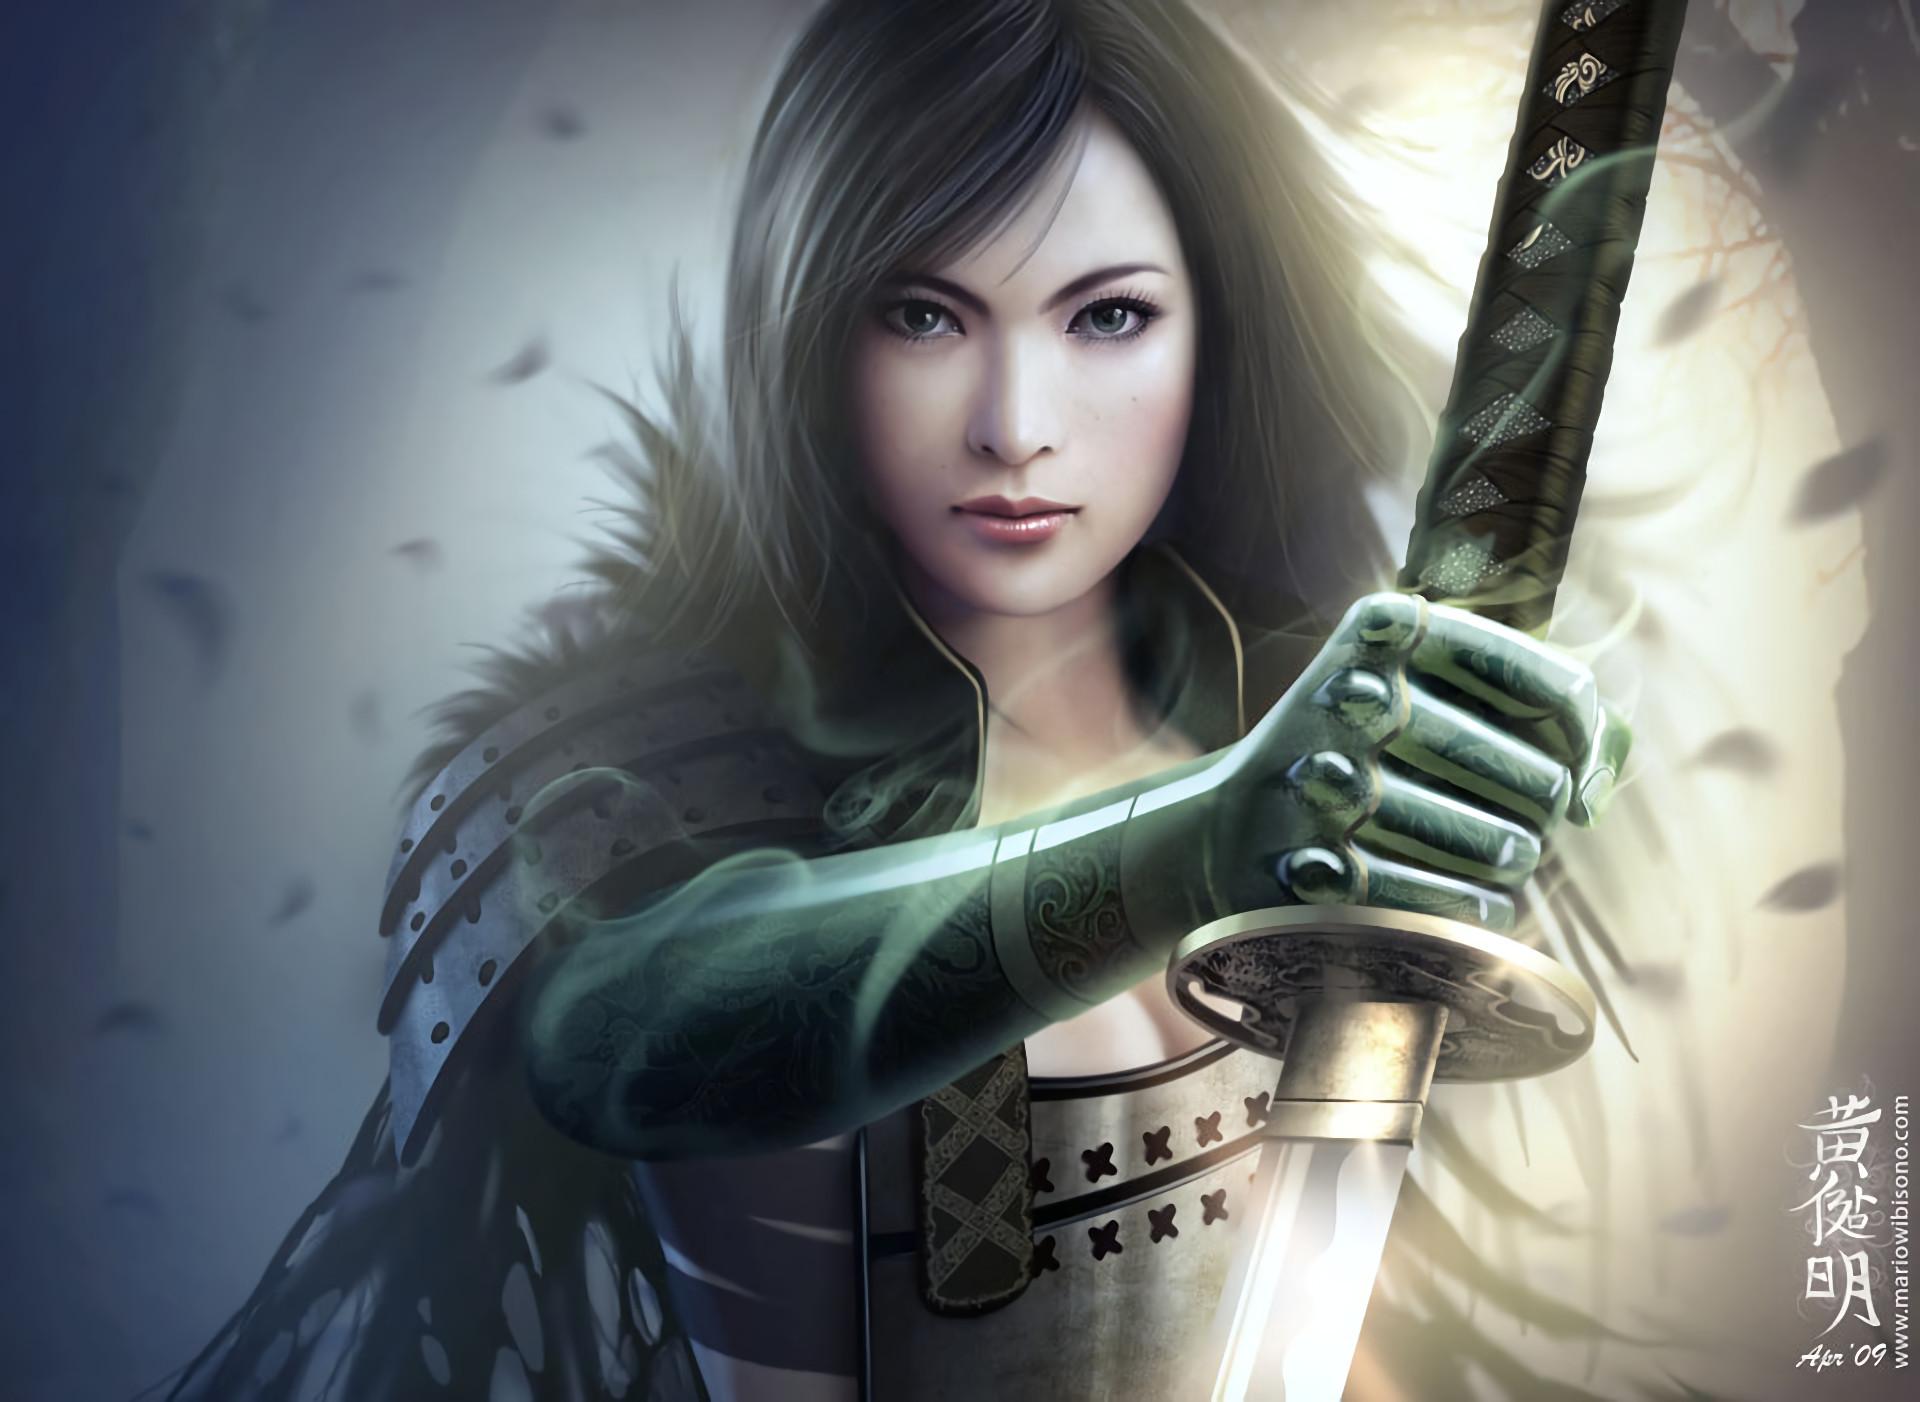 Res: 1920x1402, Fantasy - Legend Of The Five Rings Samurai Fantasy Girl Woman Warrior Armor  Wallpaper